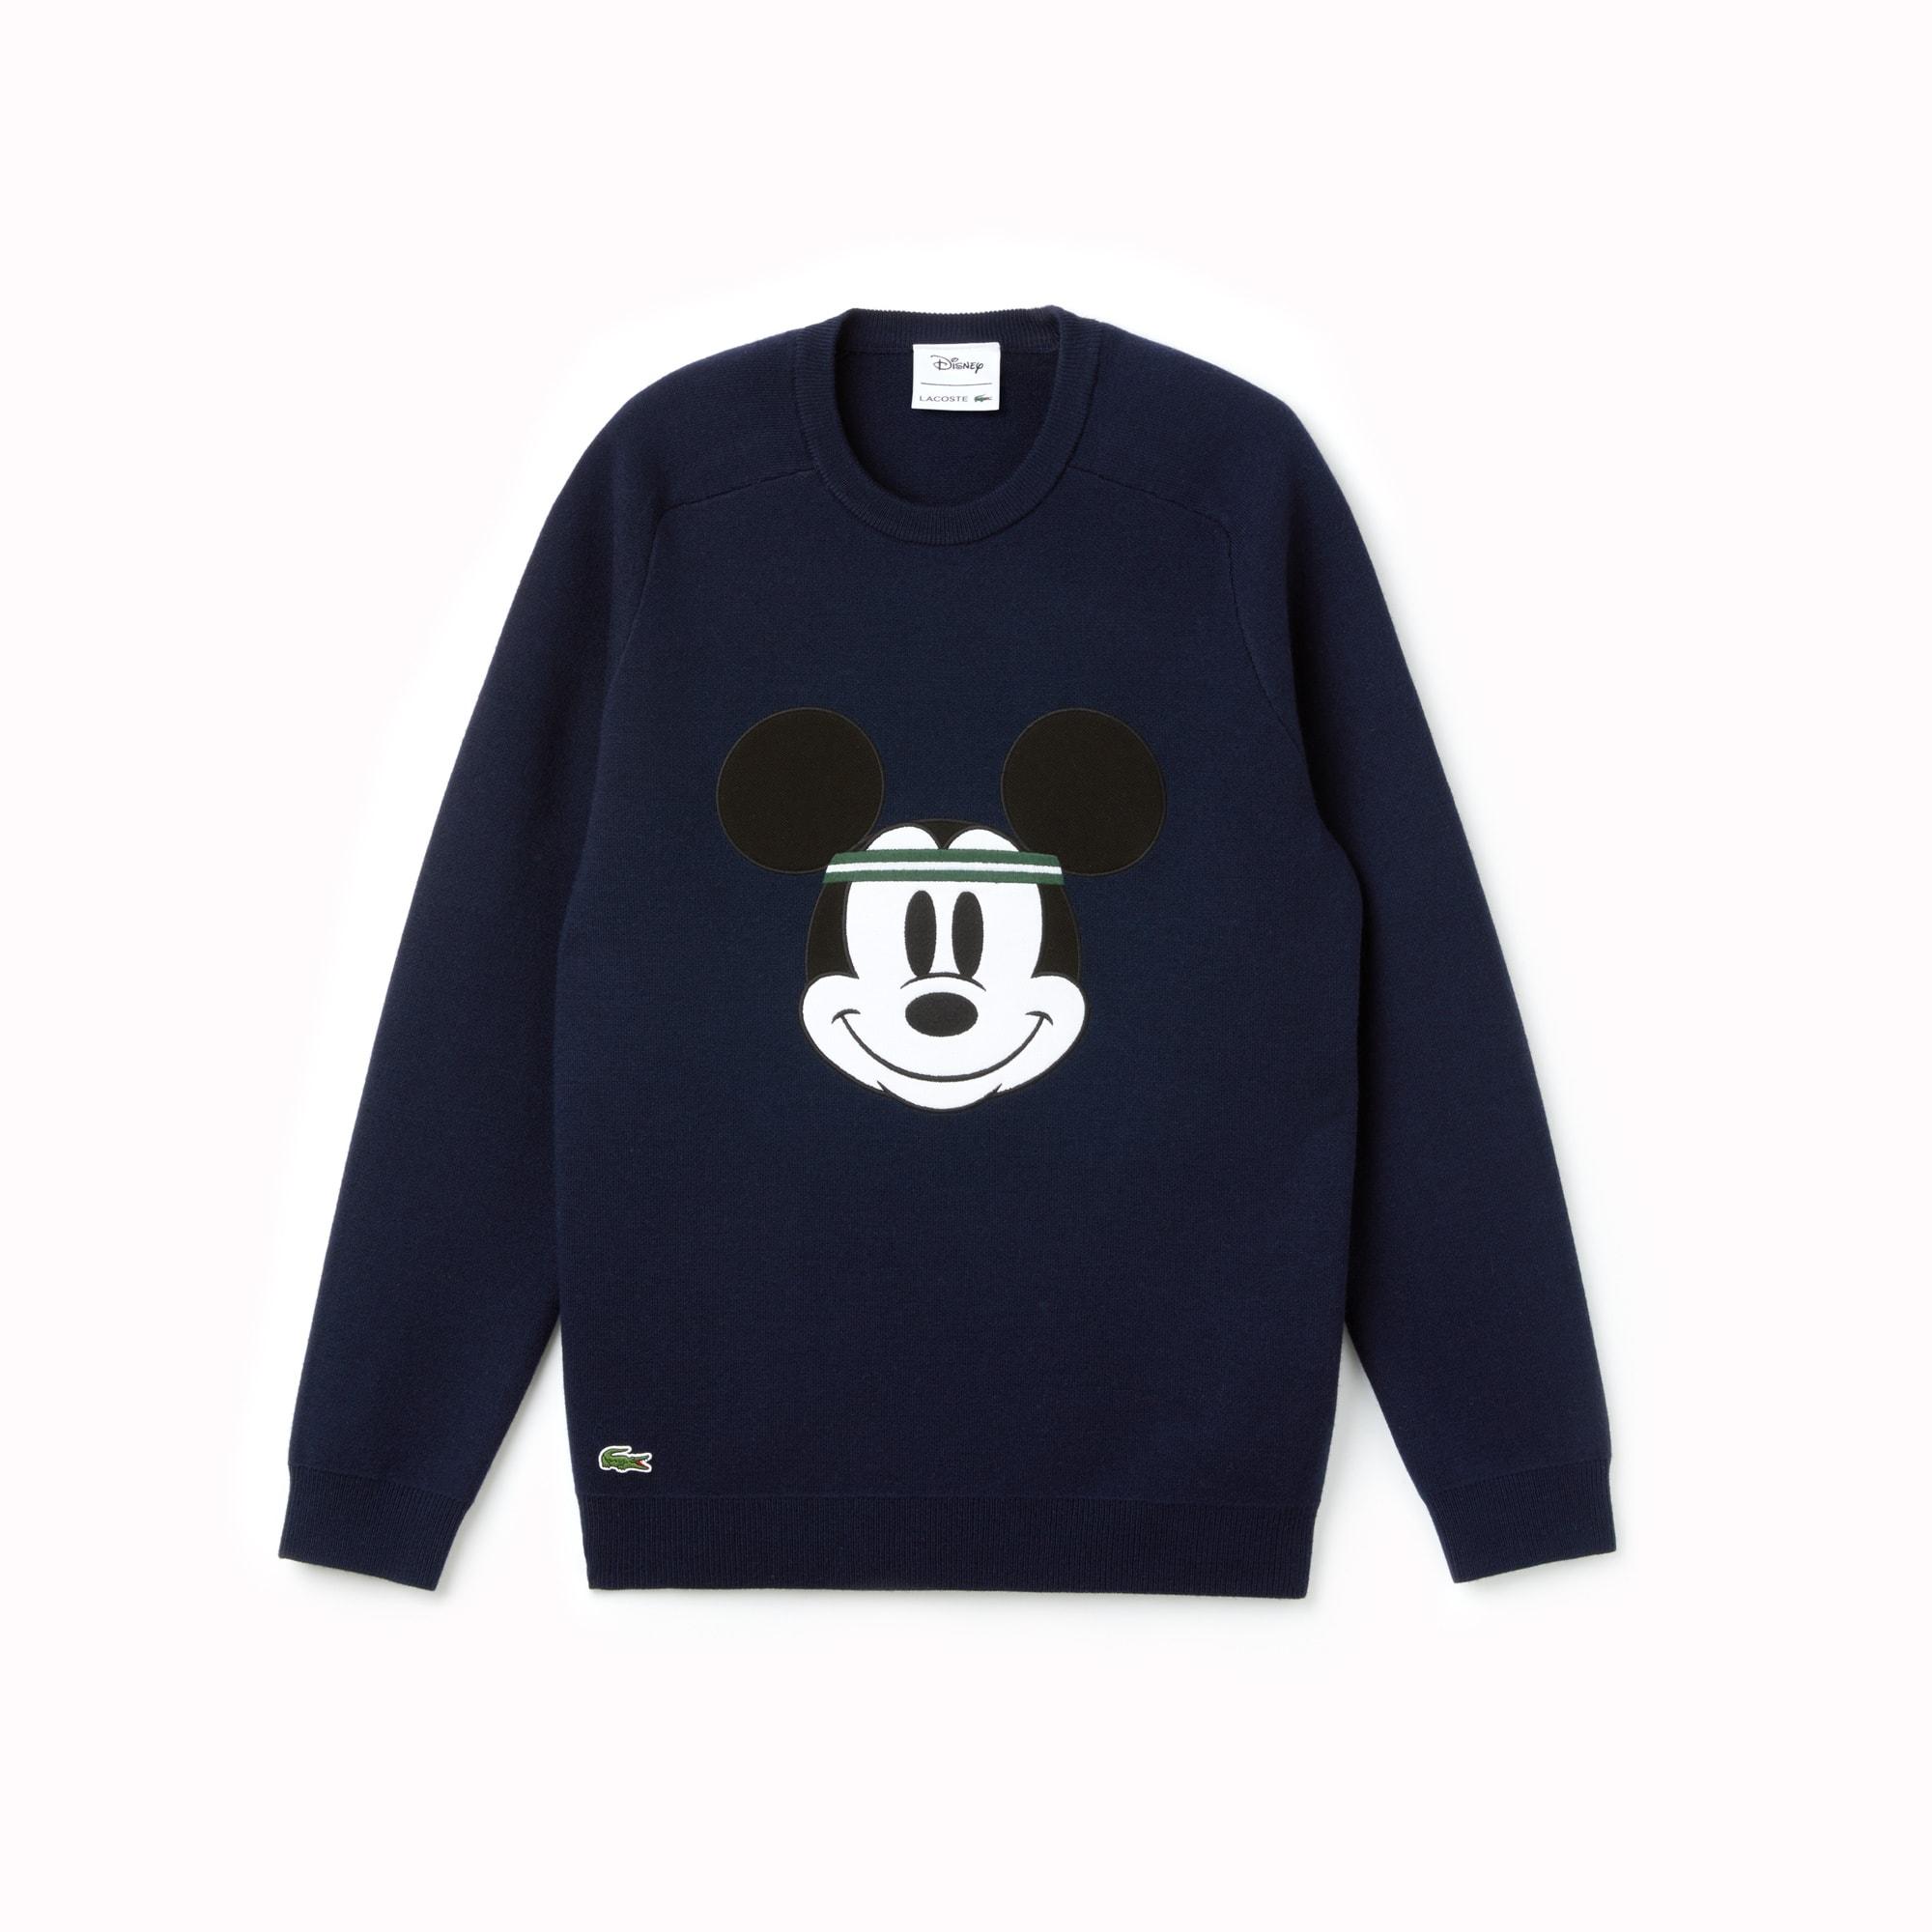 Men's Crew Neck Disney Mickey Embroidery Interlock Sweater by Lacoste